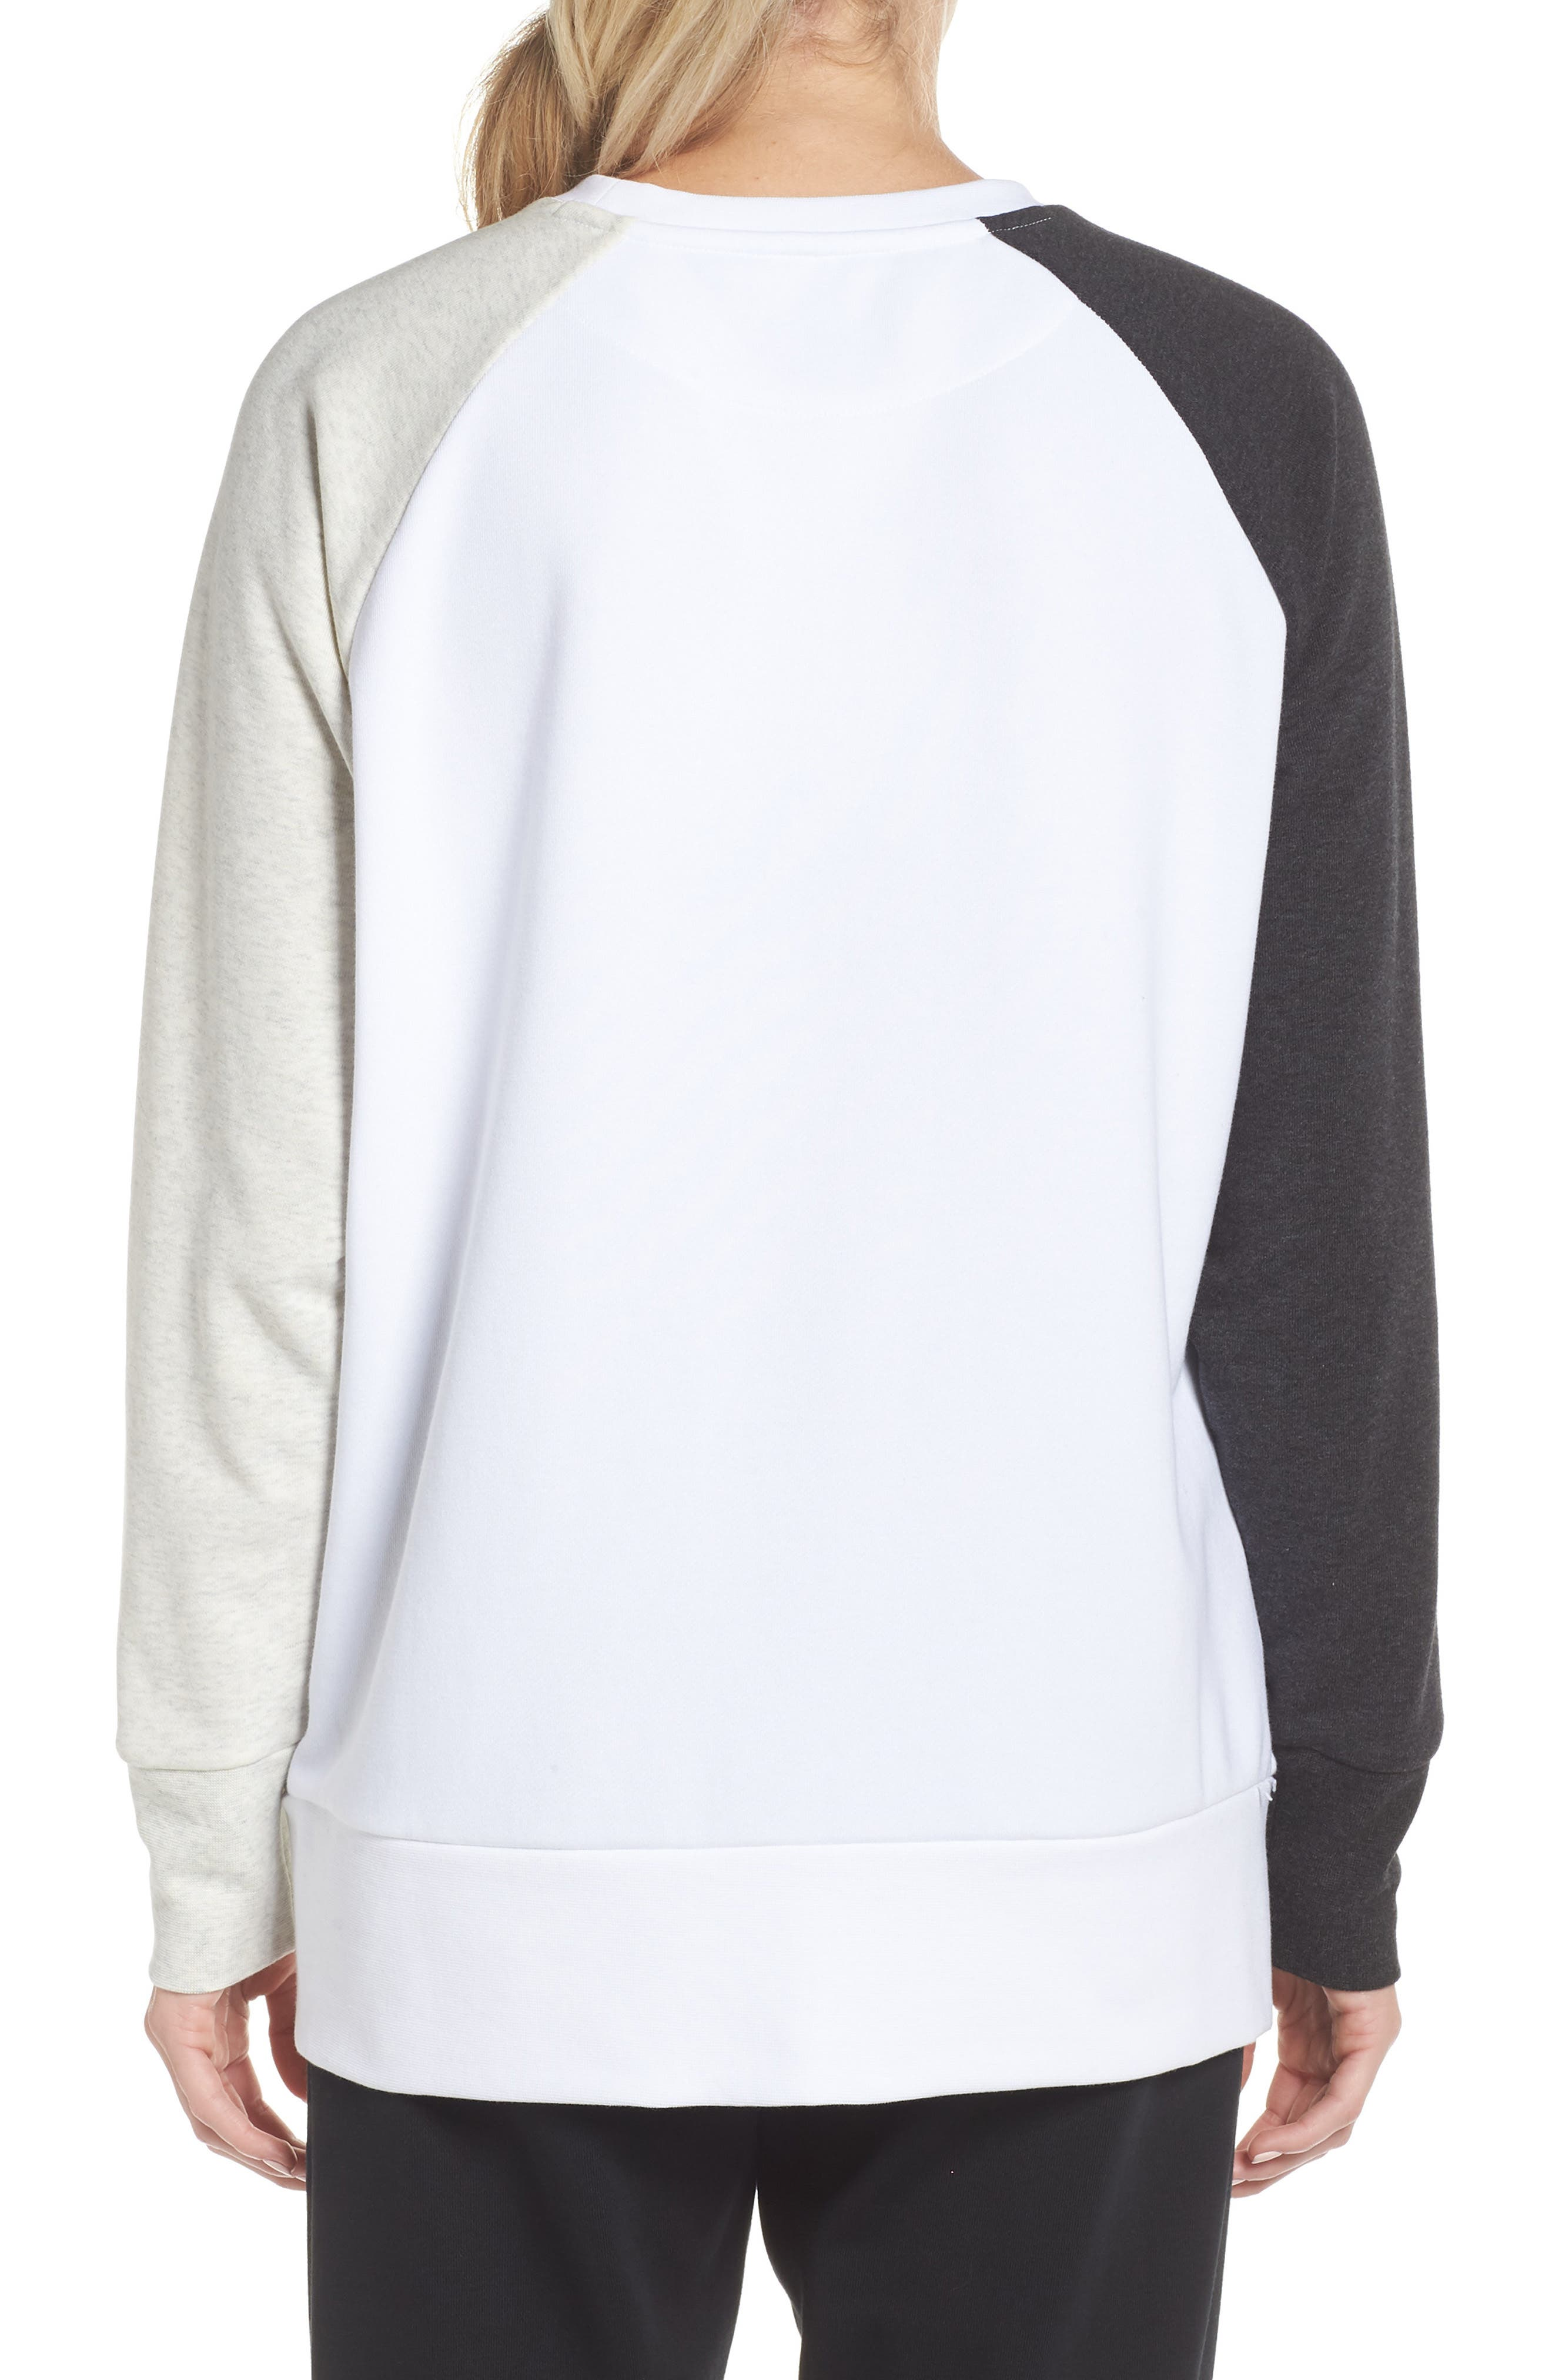 Dry Swoosh Sweatshirt,                             Alternate thumbnail 2, color,                             WHITE/ BLACK HEATHER/ WHITE